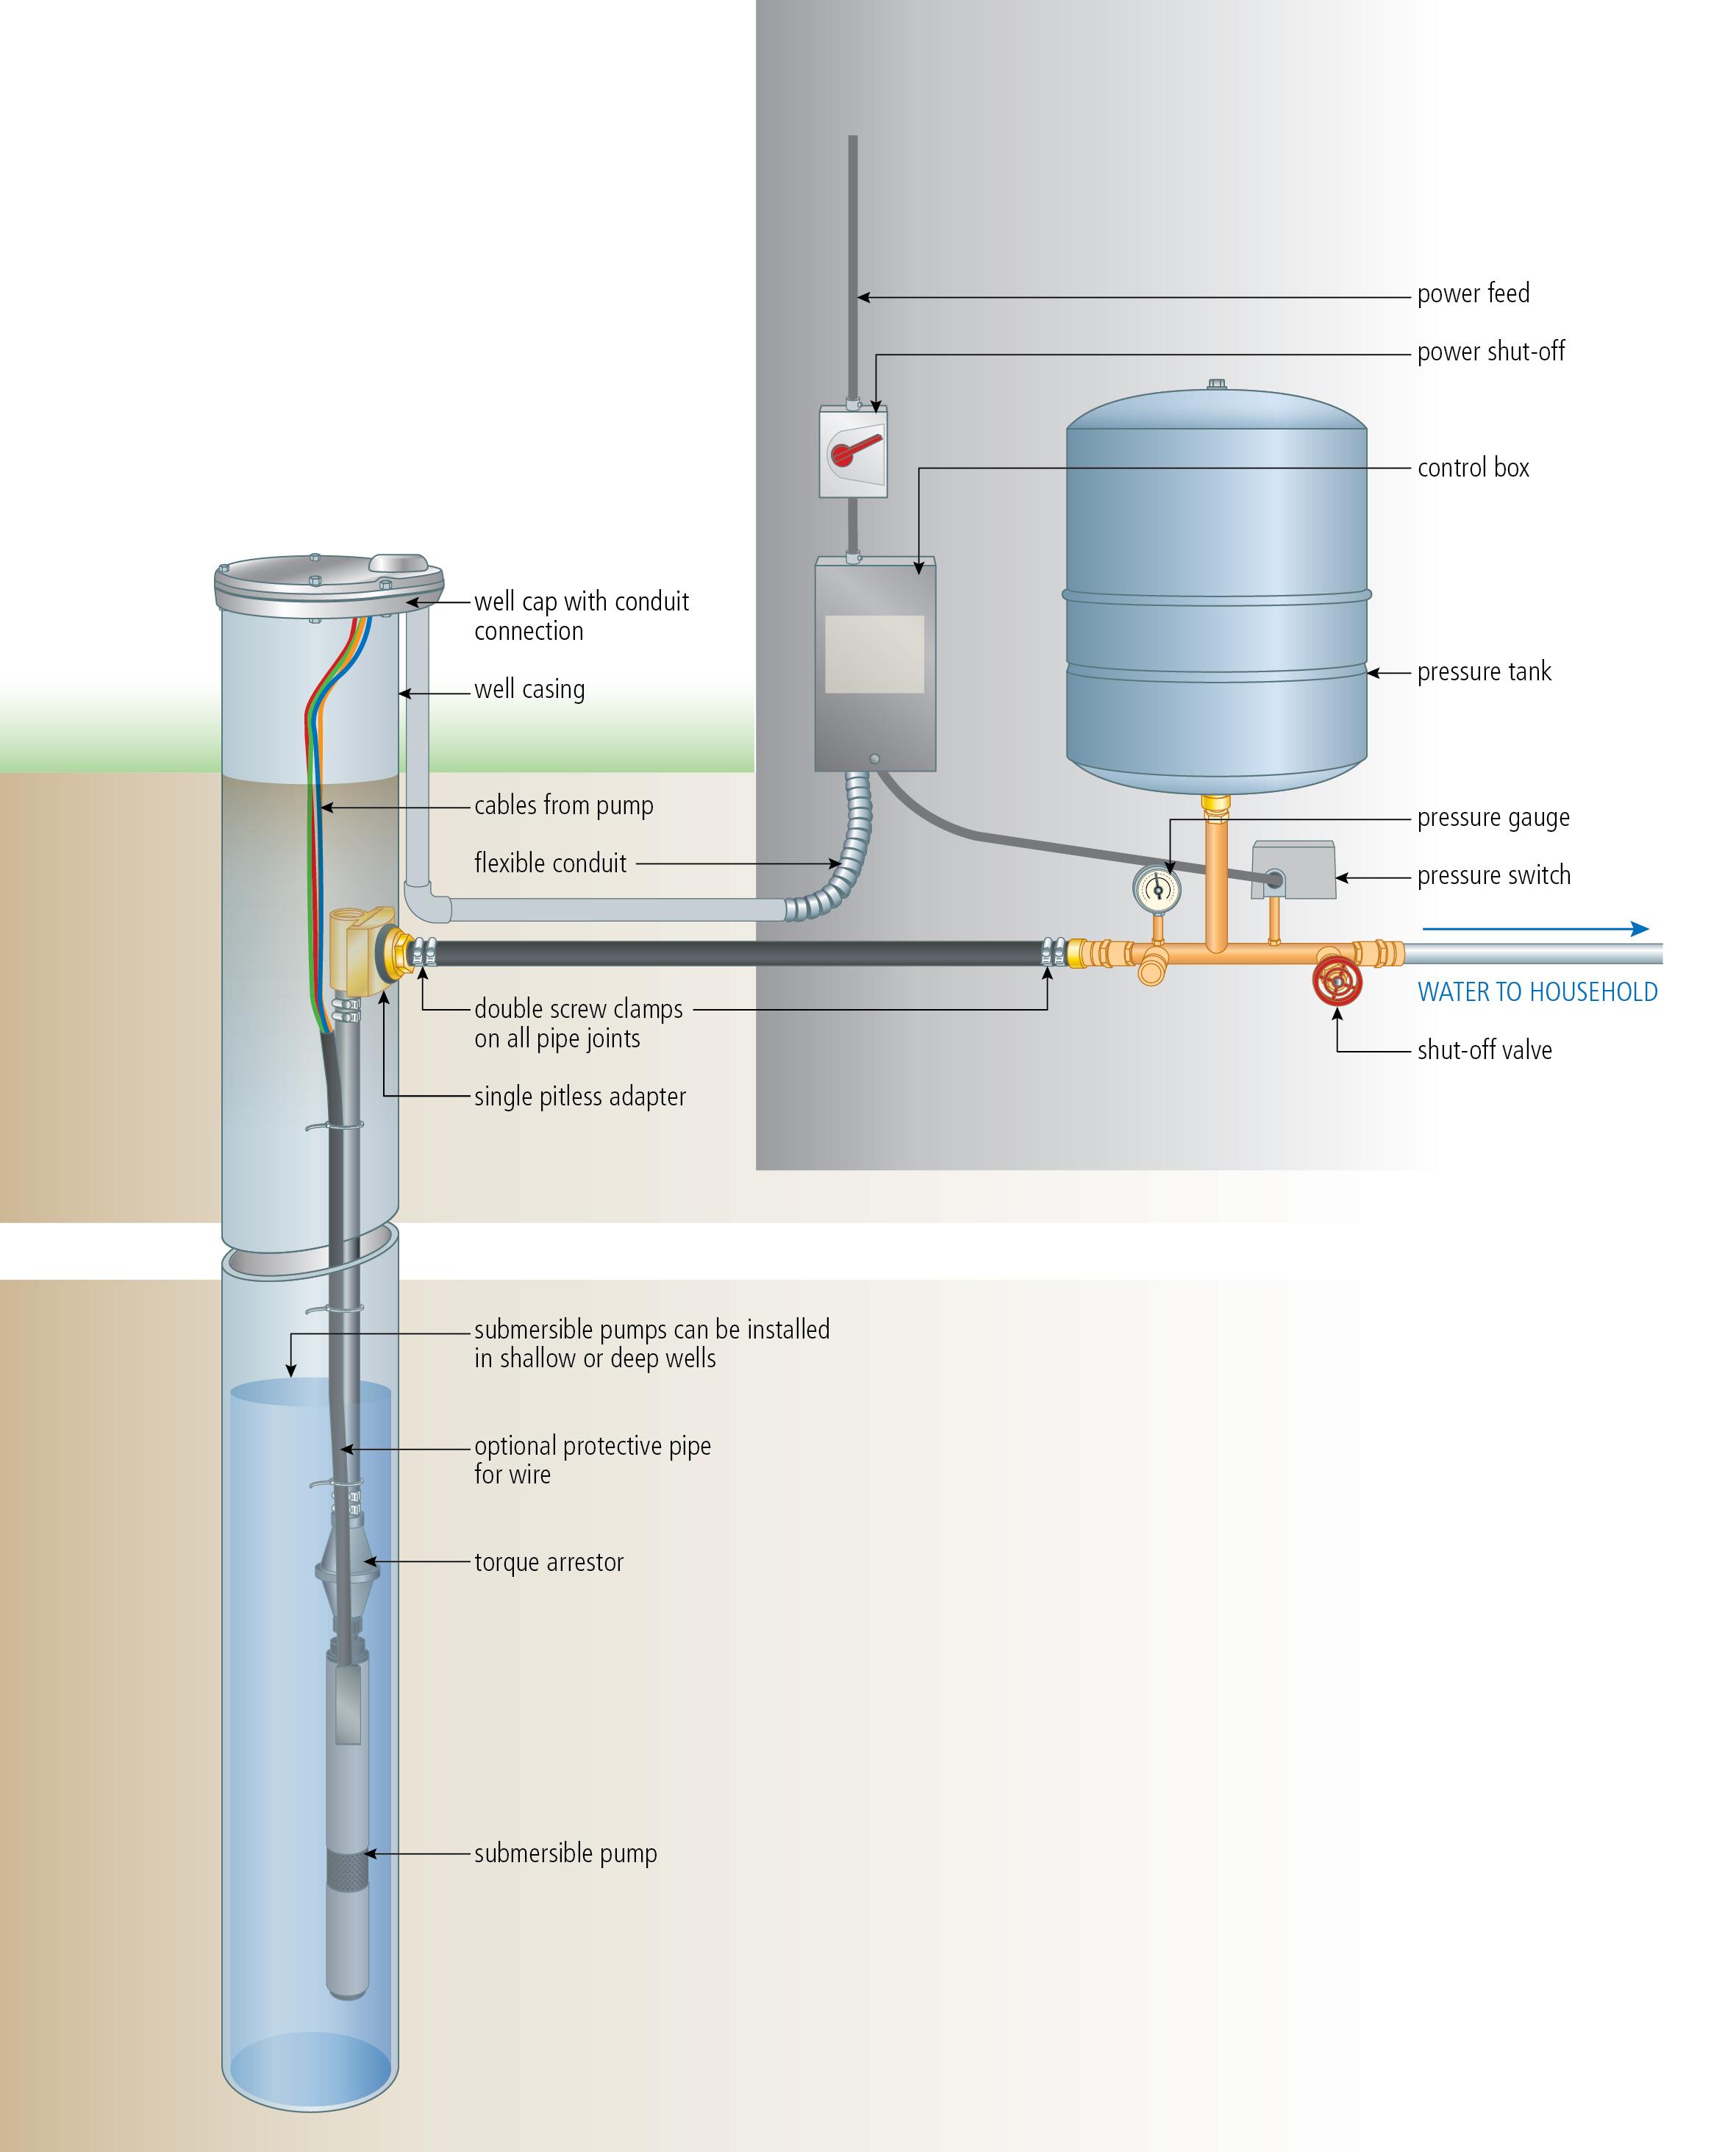 3 Wire Submersible Pump Wiring Diagram | Wiring Diagram - 3 Wire Well Pump Wiring Diagram